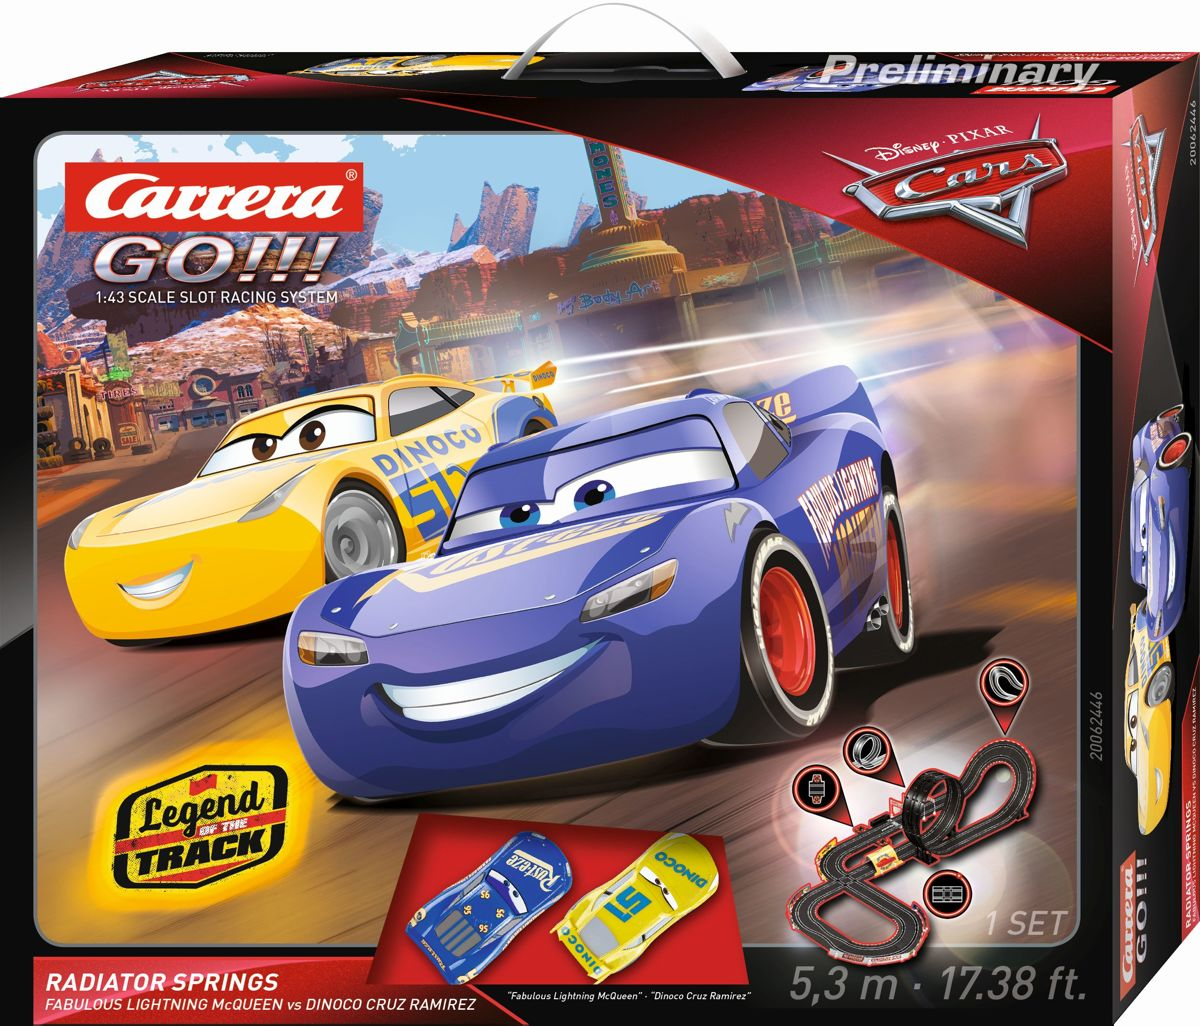 Carrera Go racebaan Disney Pixar Cars 530 cm zwart